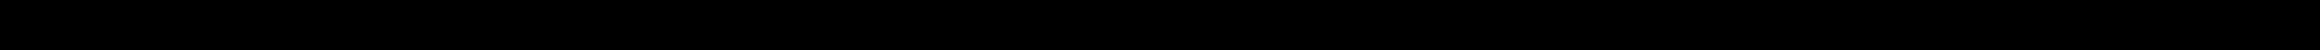 MANN-FILTER 106.5945, 2710800M2, 3018713, APBR00005, X810.270.073.000 Légszűrő